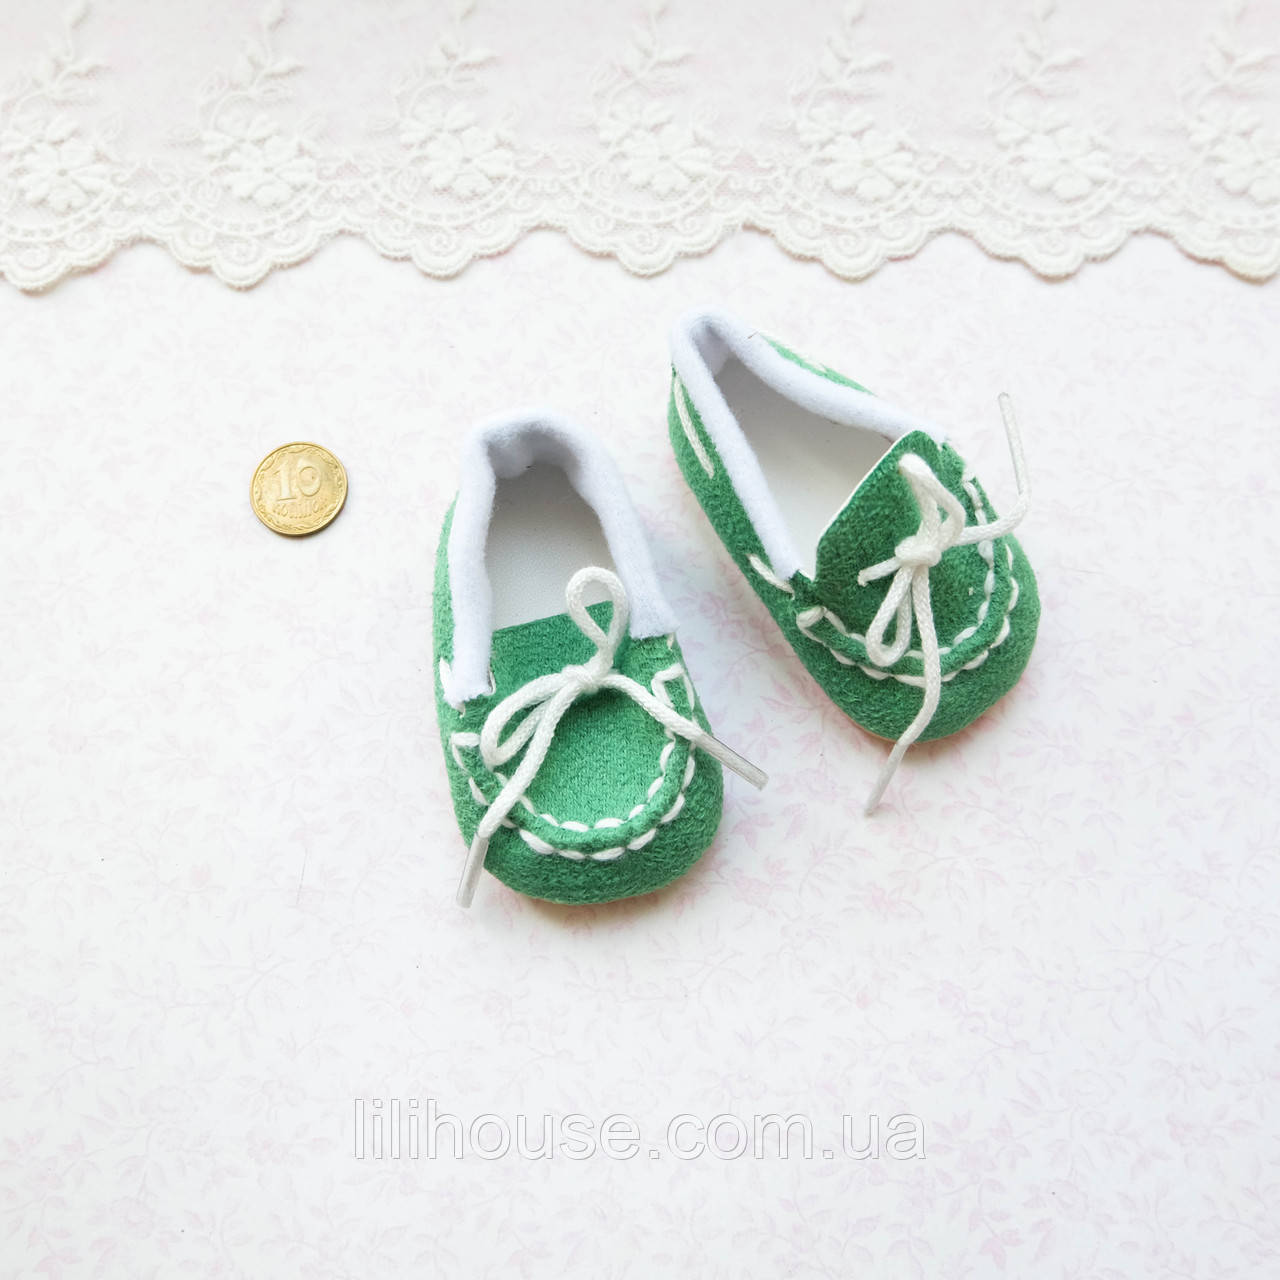 Обувь для кукол Мокасины Замша 7*3 см ЗЕЛЕНЫЕ